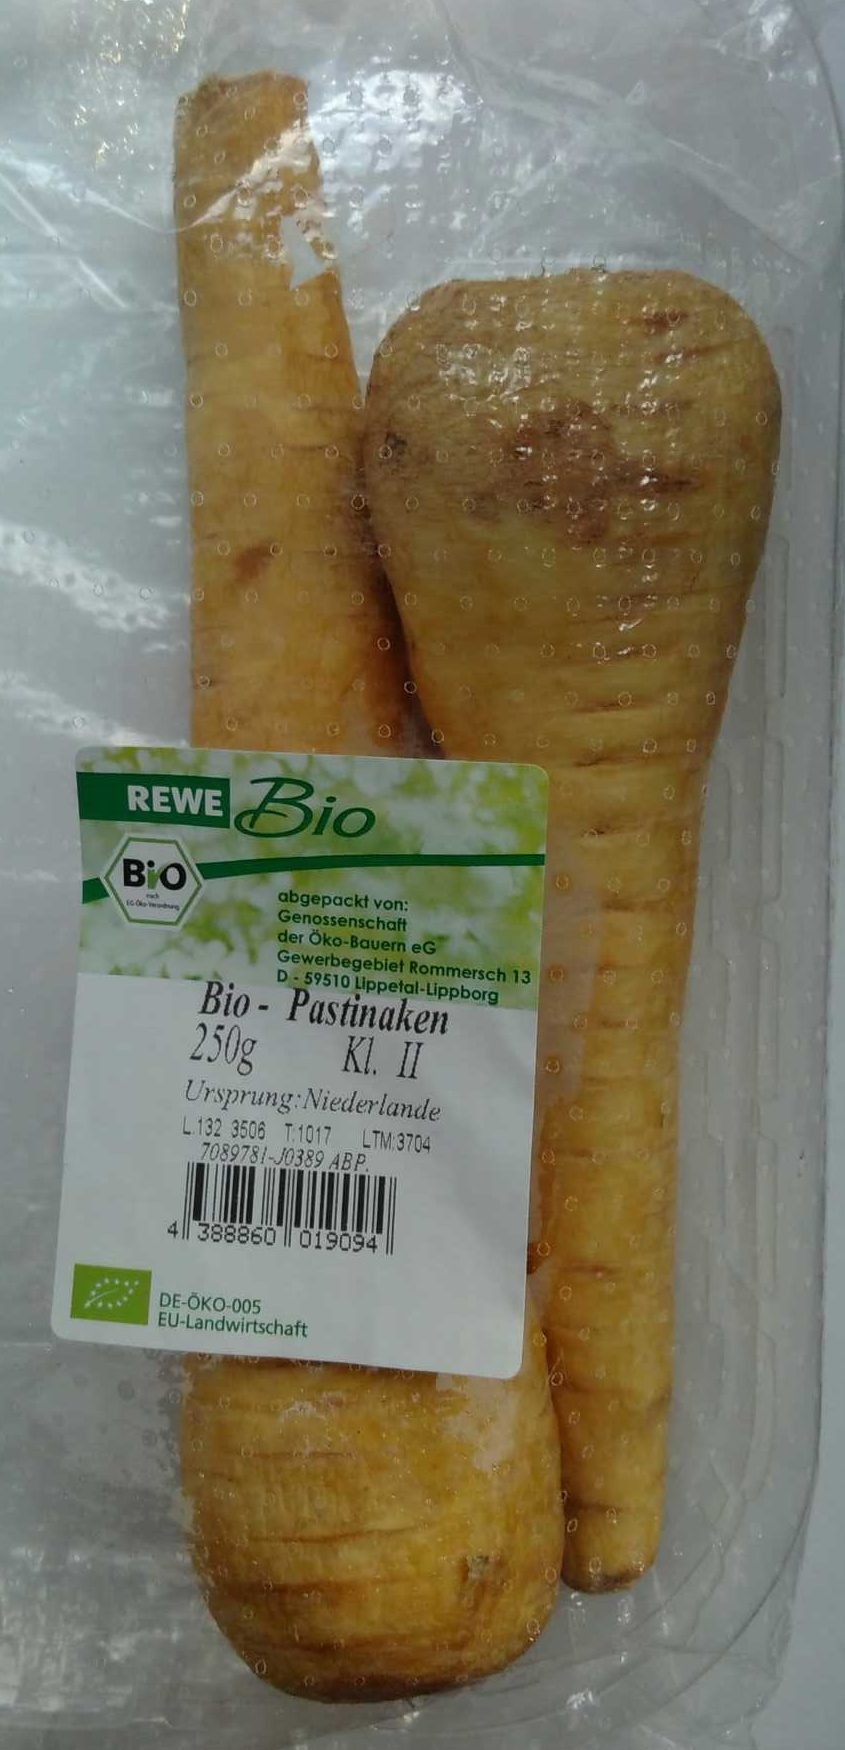 Bio-Pastinaken - Produit